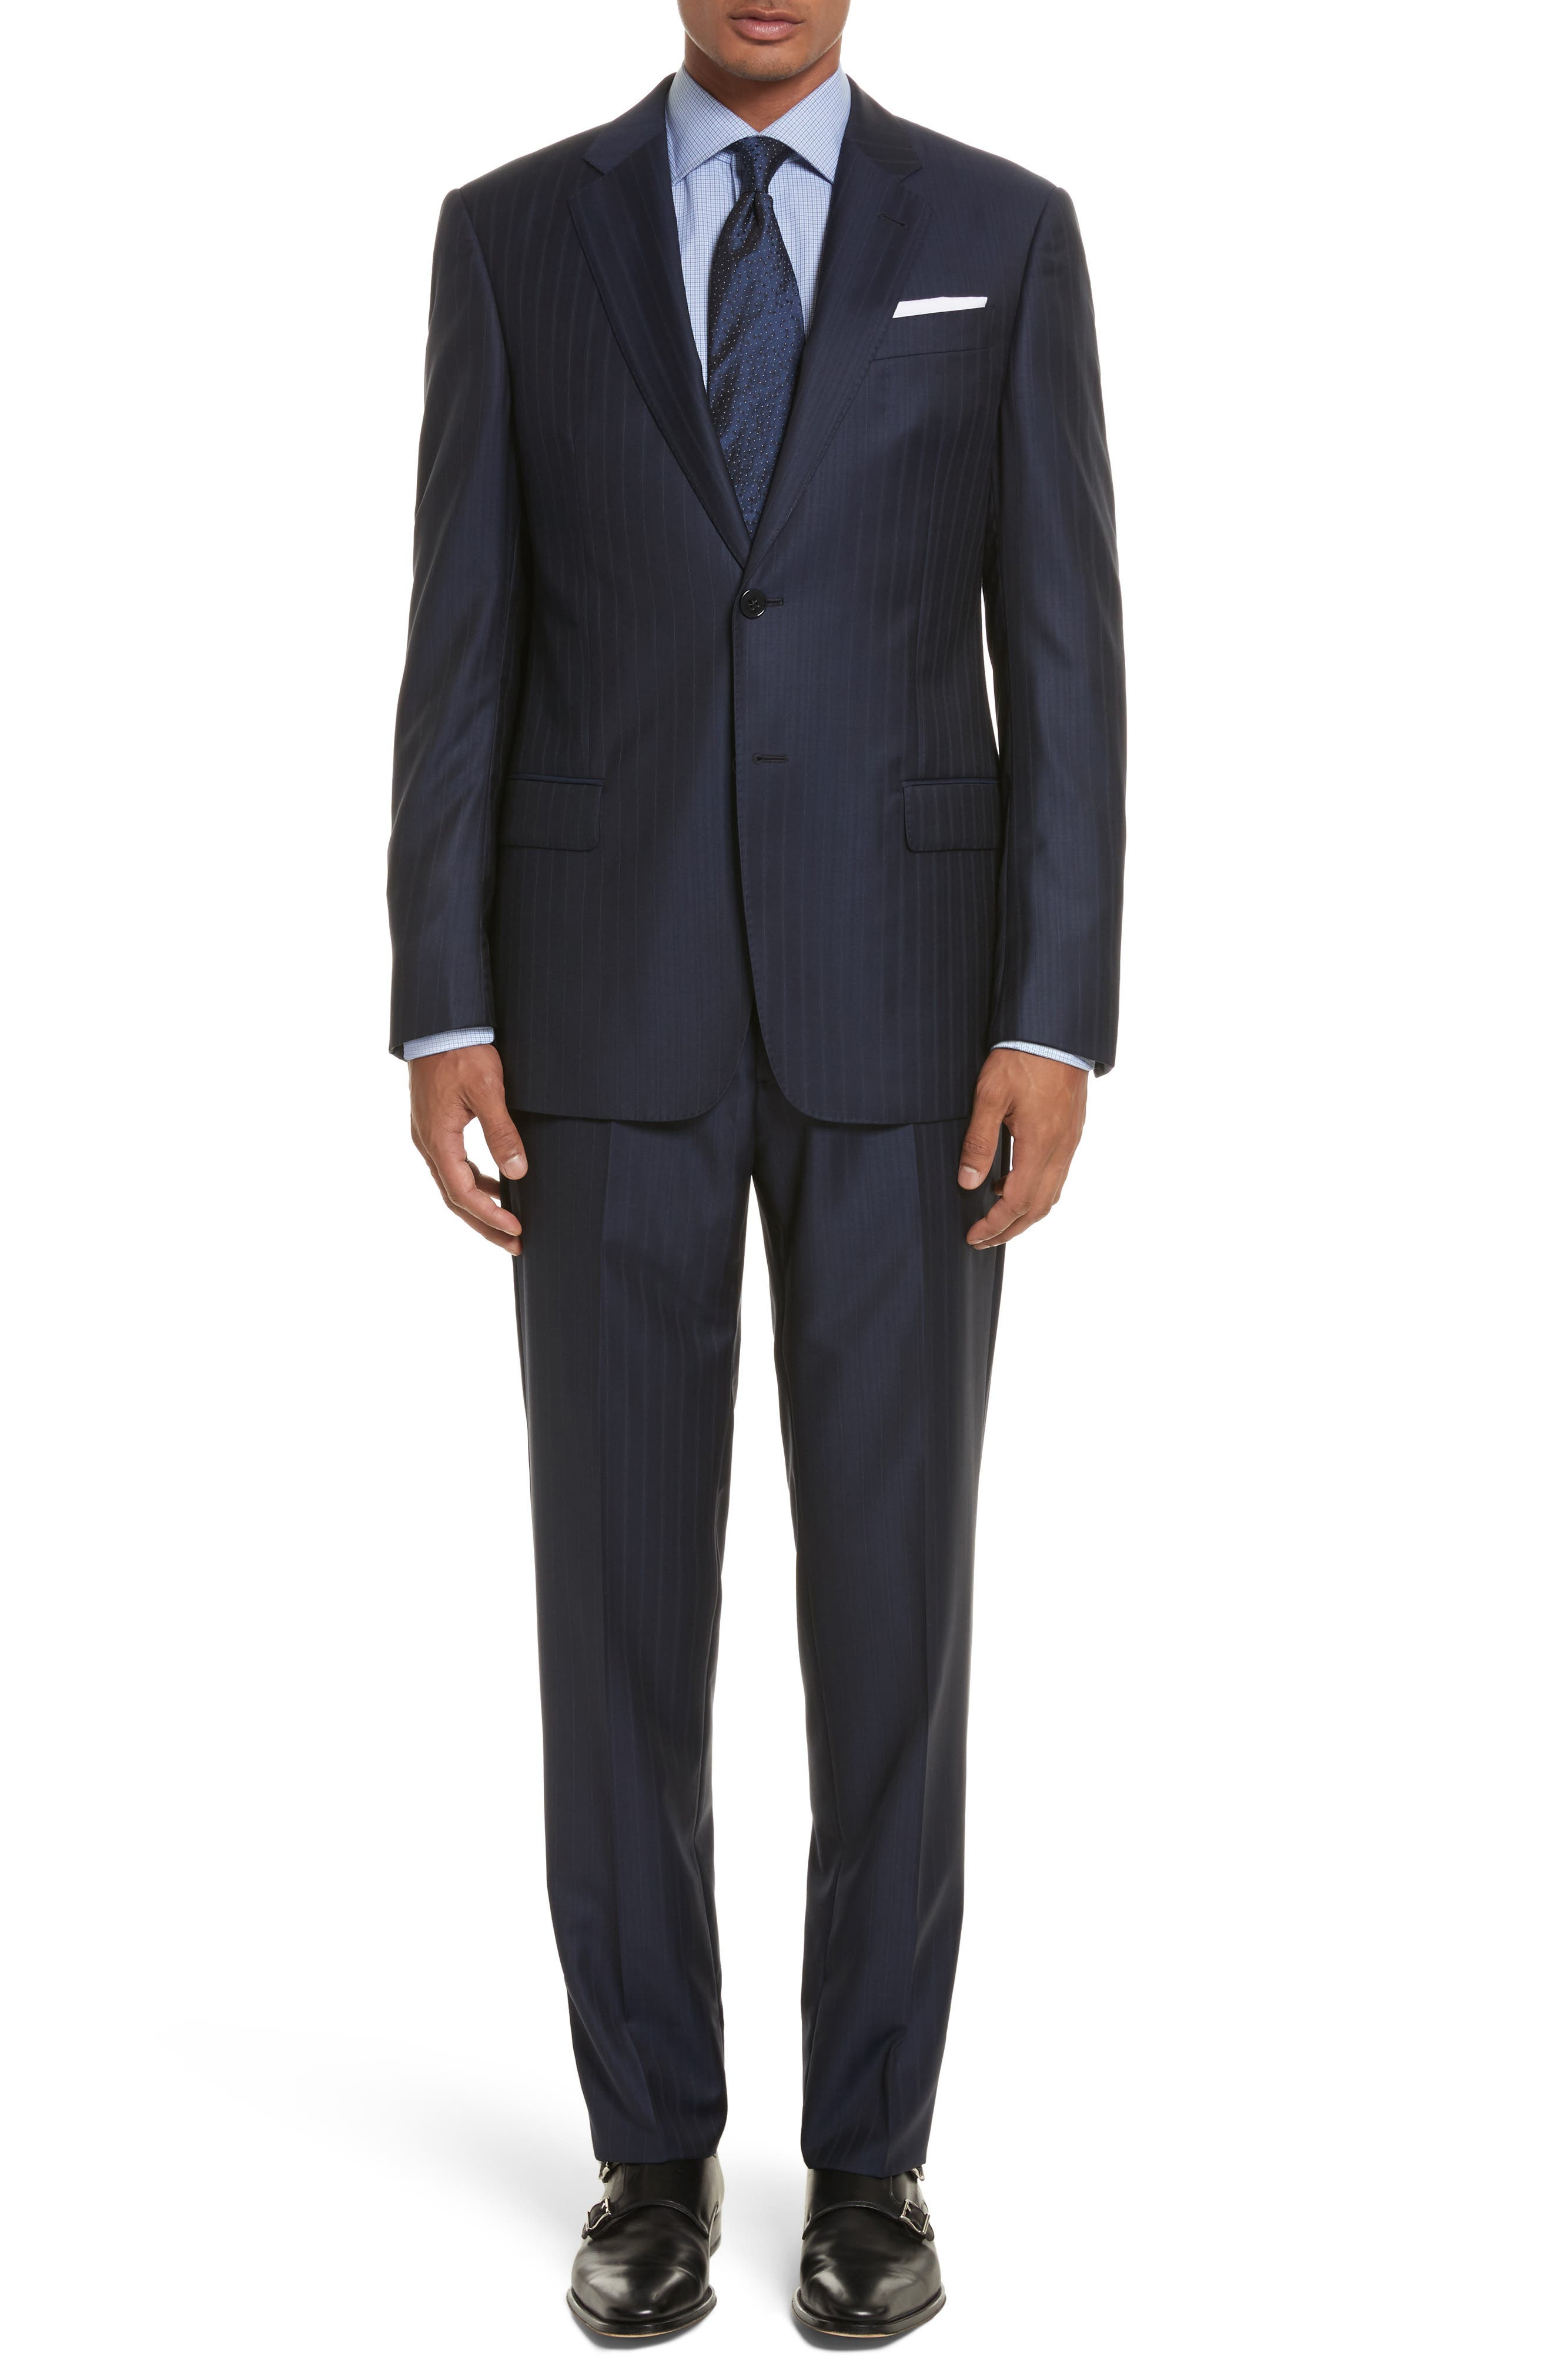 Alternate Image 1 Selected - Armani Collezioni G-Line Trim Fit Stripe Wool Suit